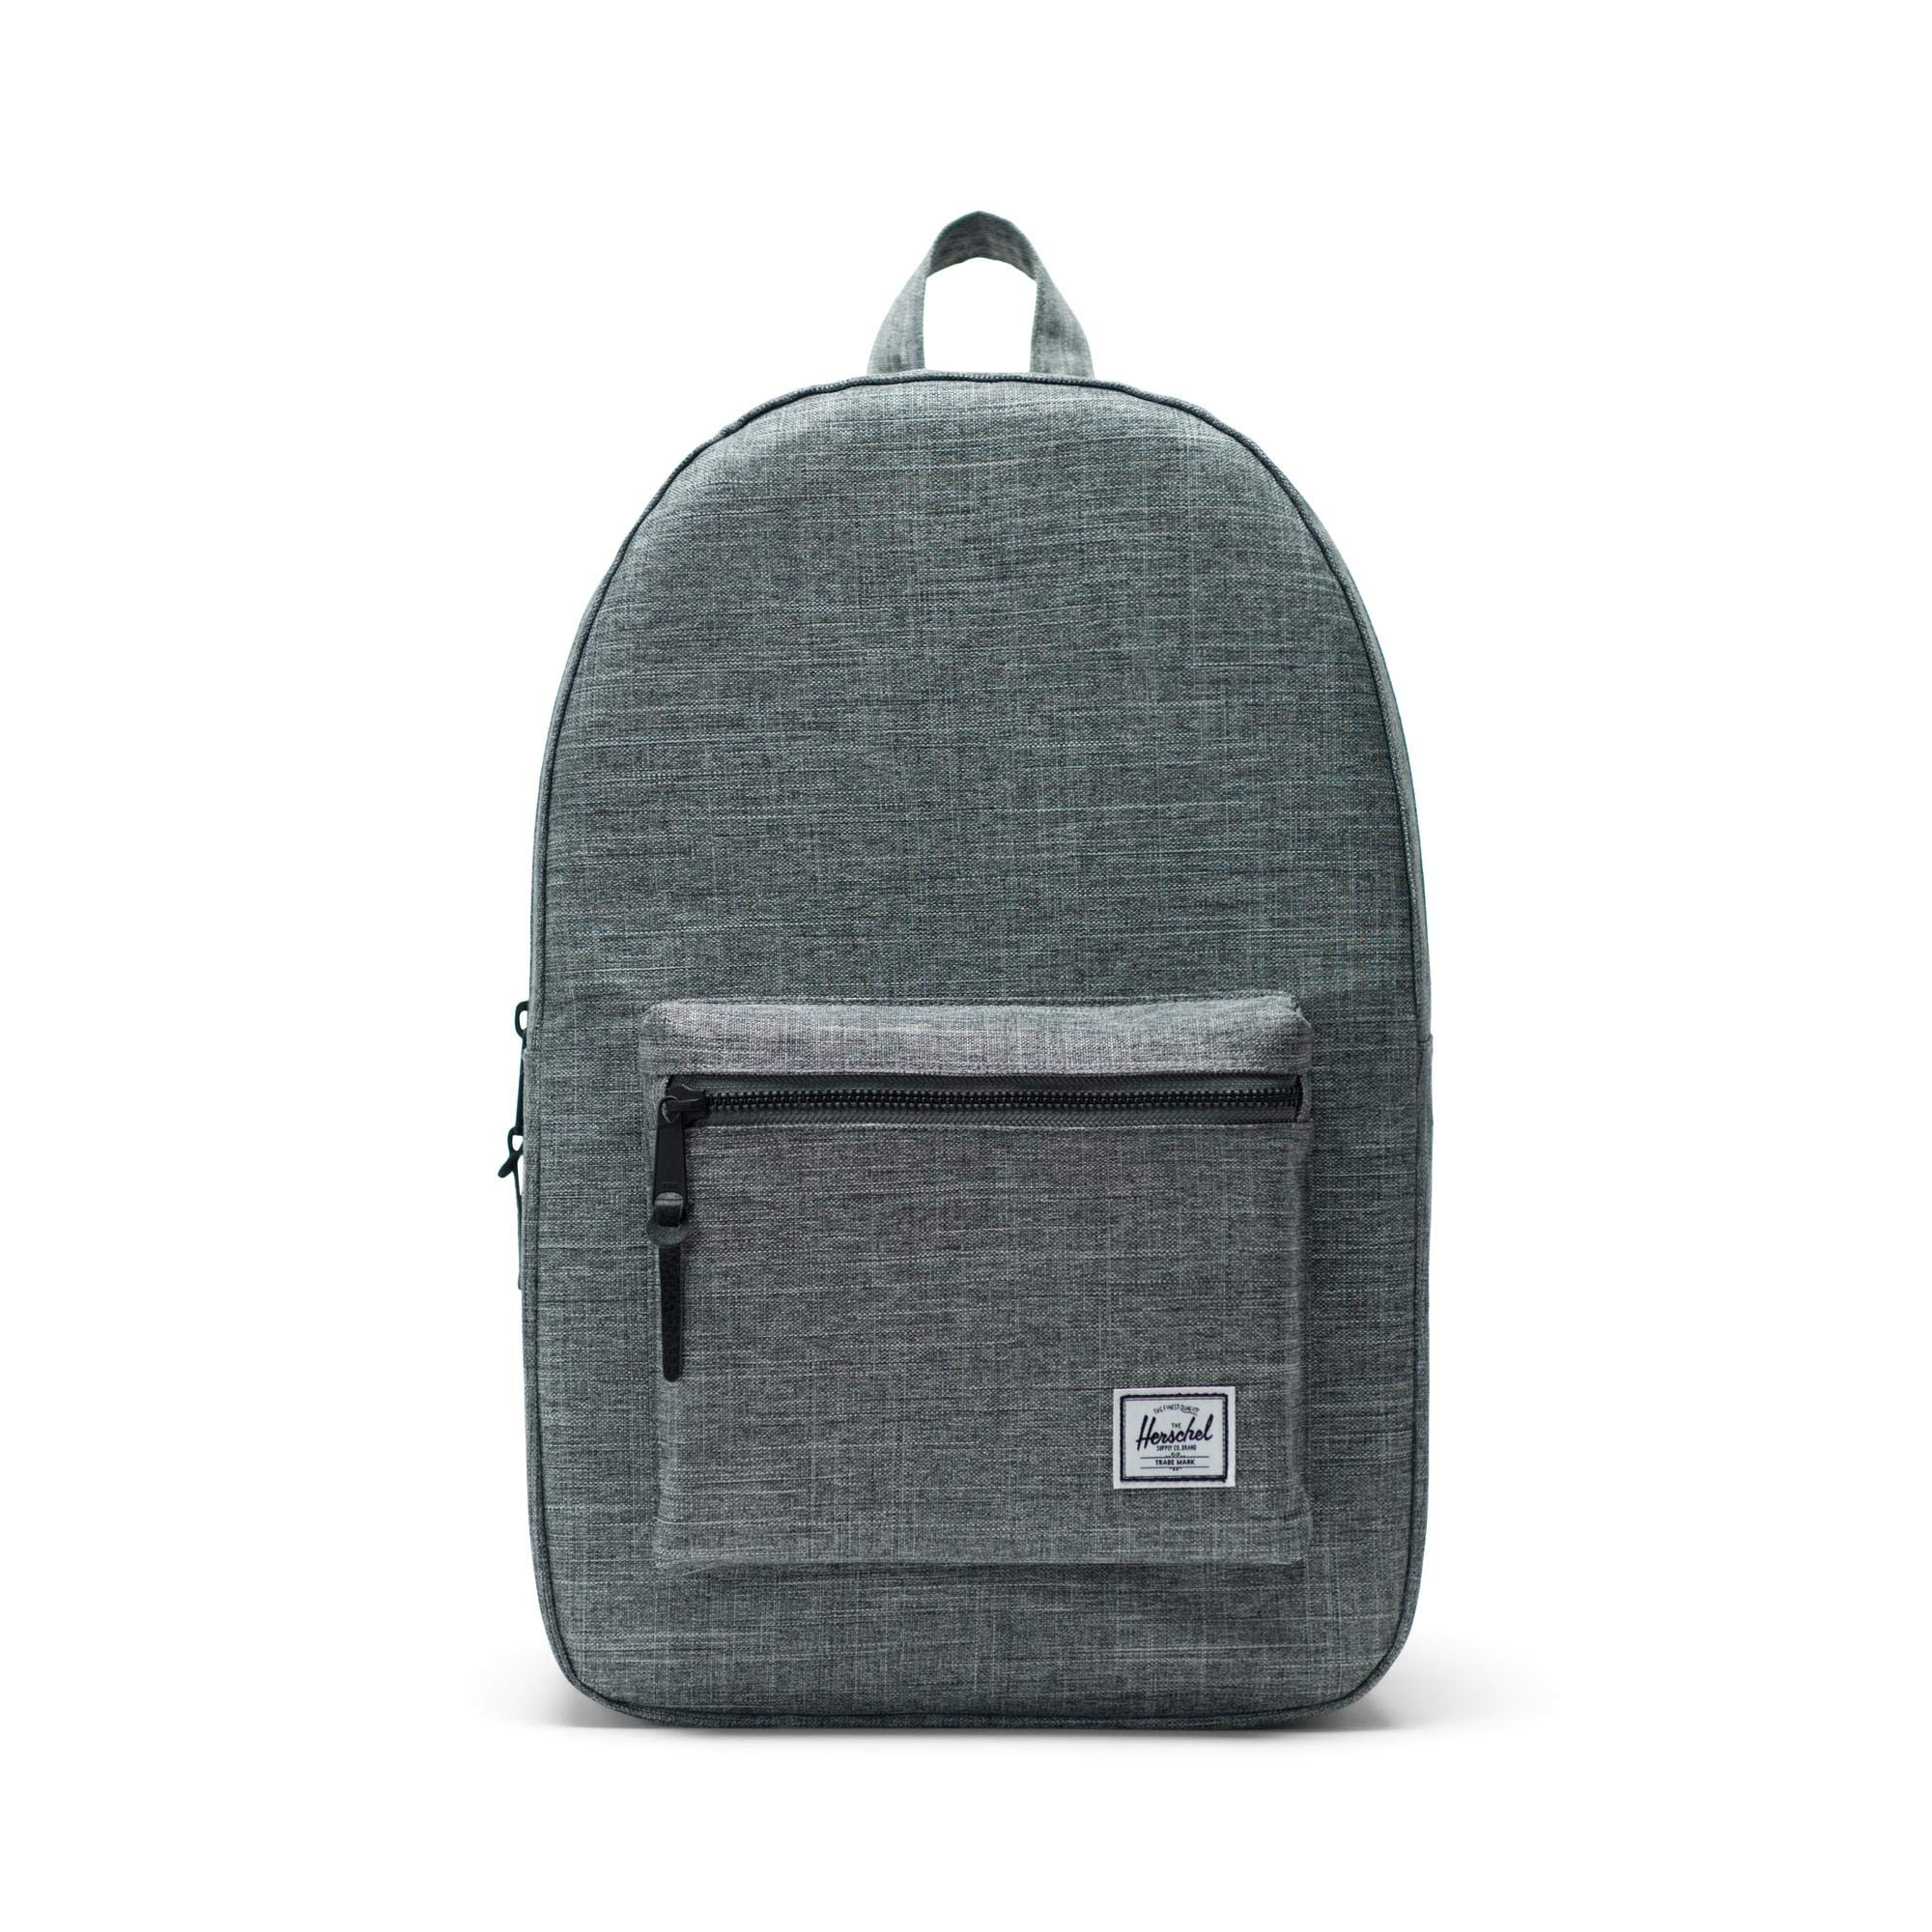 Herschel Settlement Backpack-Raven Crosshatch